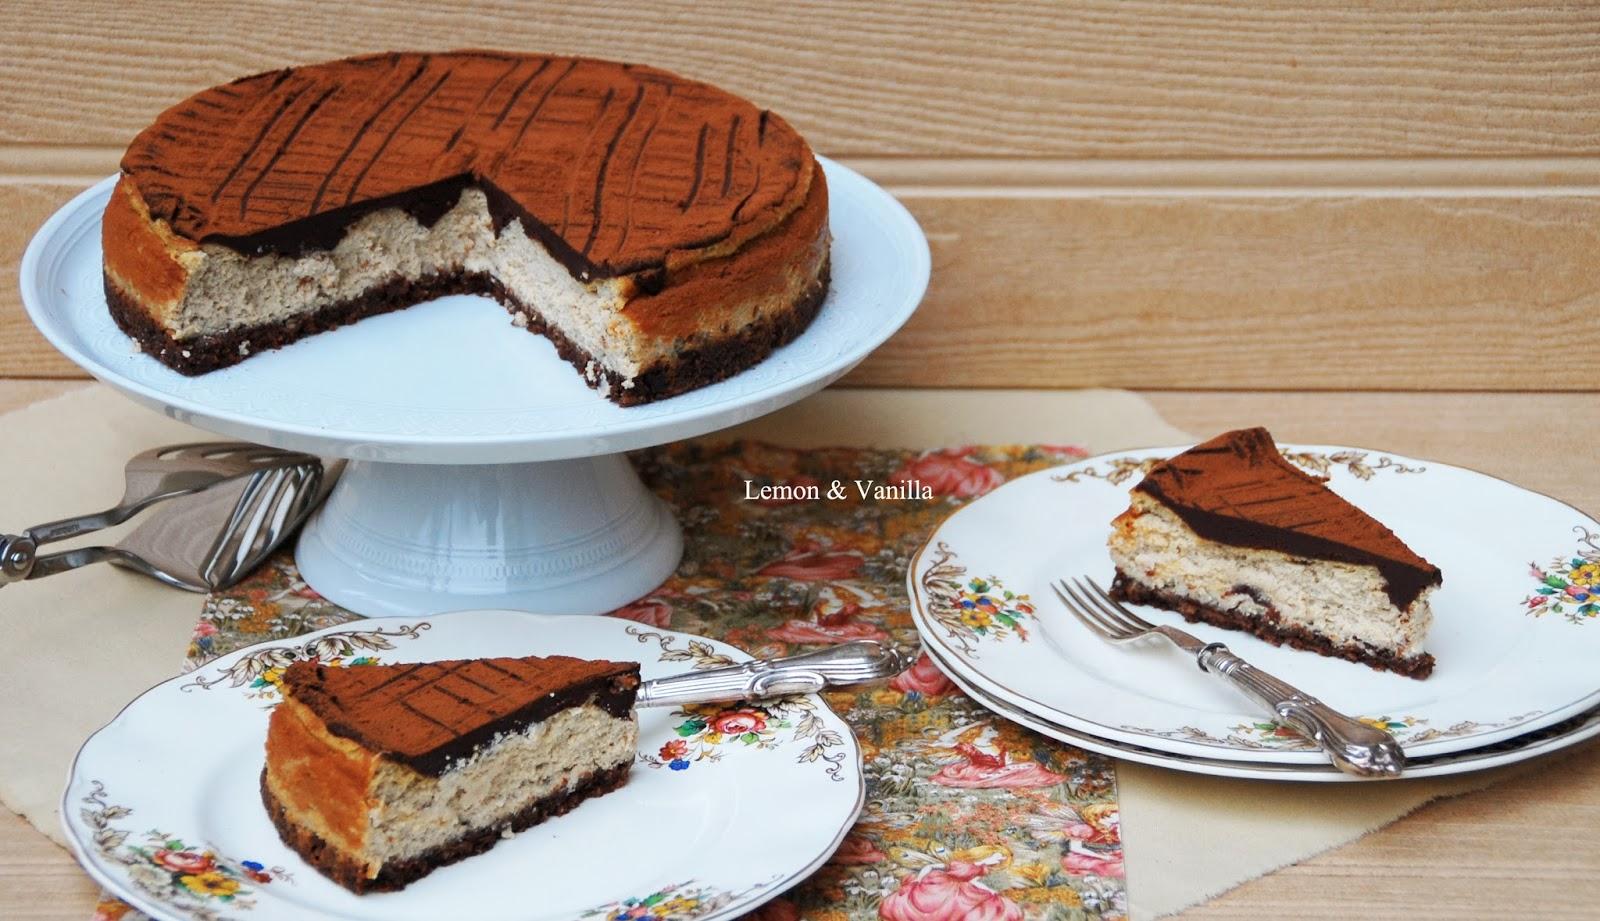 ... : Chocolate and coffee cheesecake / Cheesecake de chocolate e café